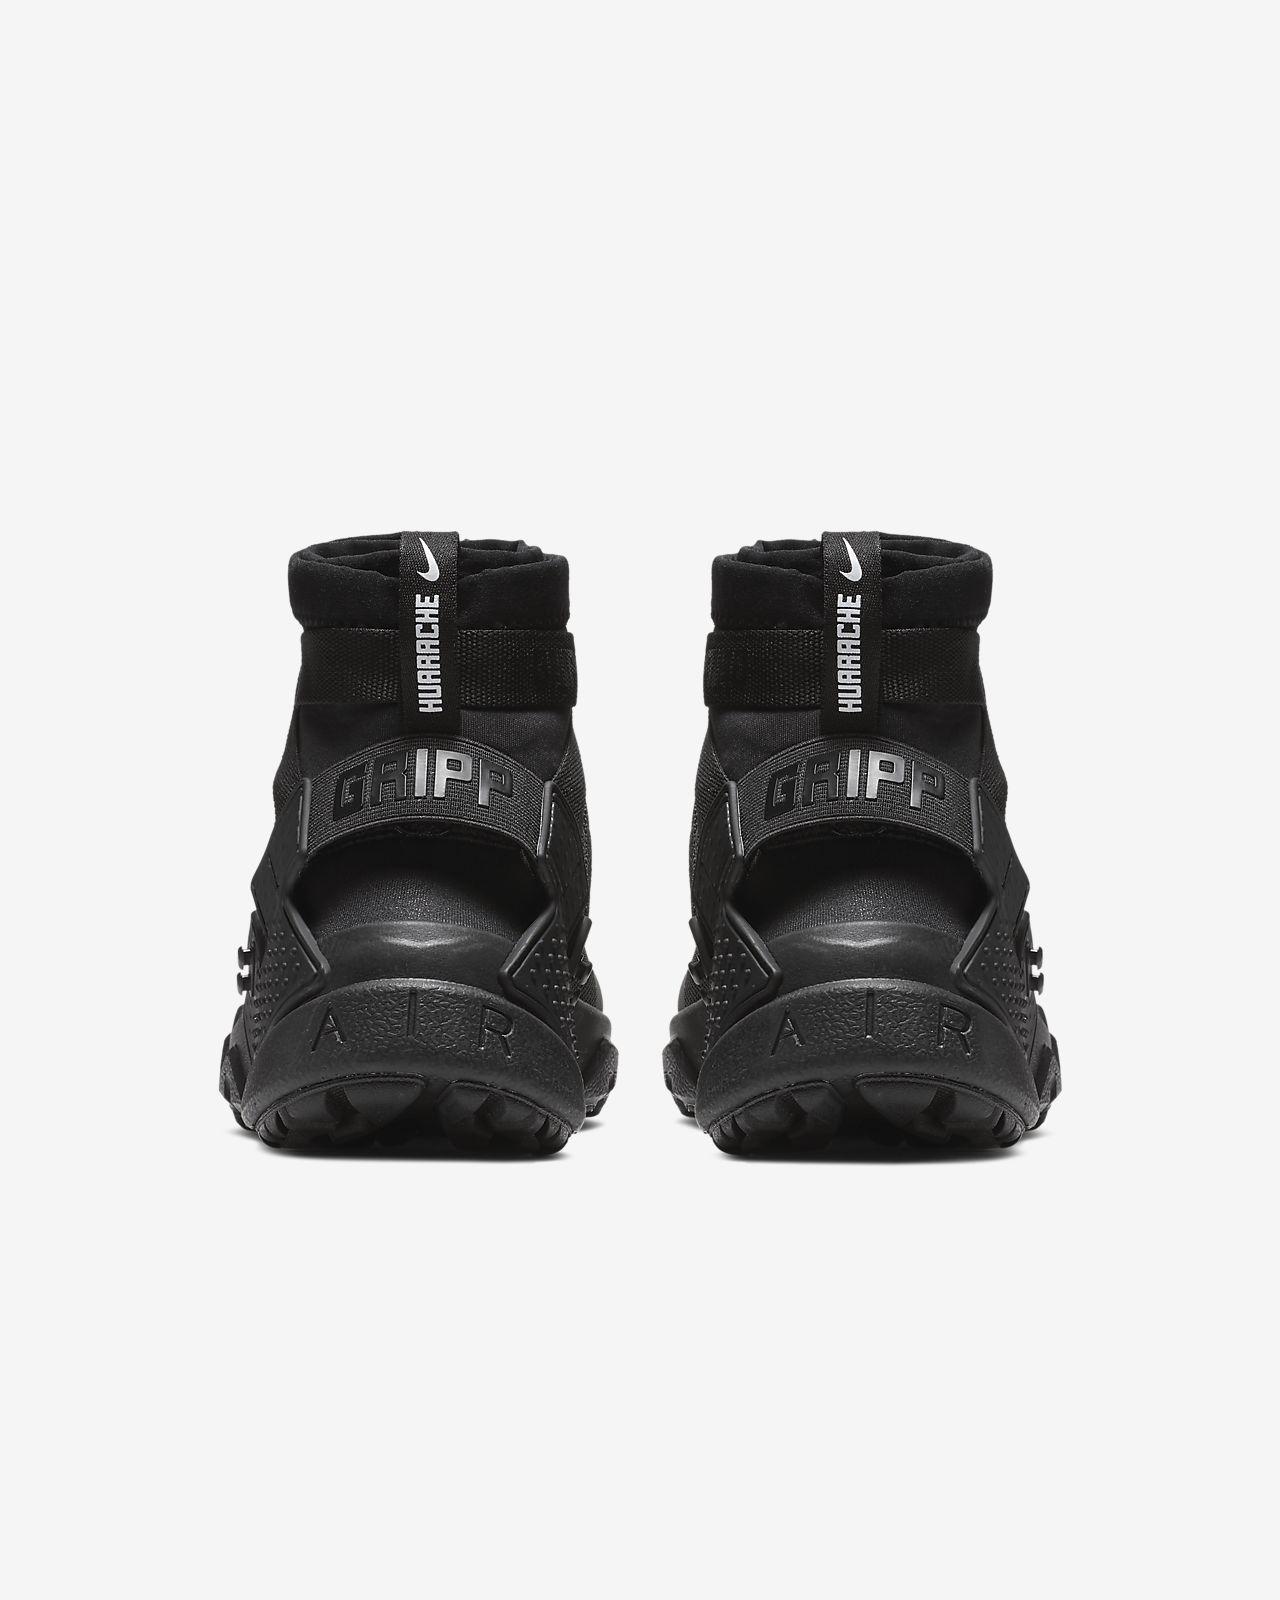 save off 780be 5d52a ... Nike Air Huarache Gripp Men s Shoe